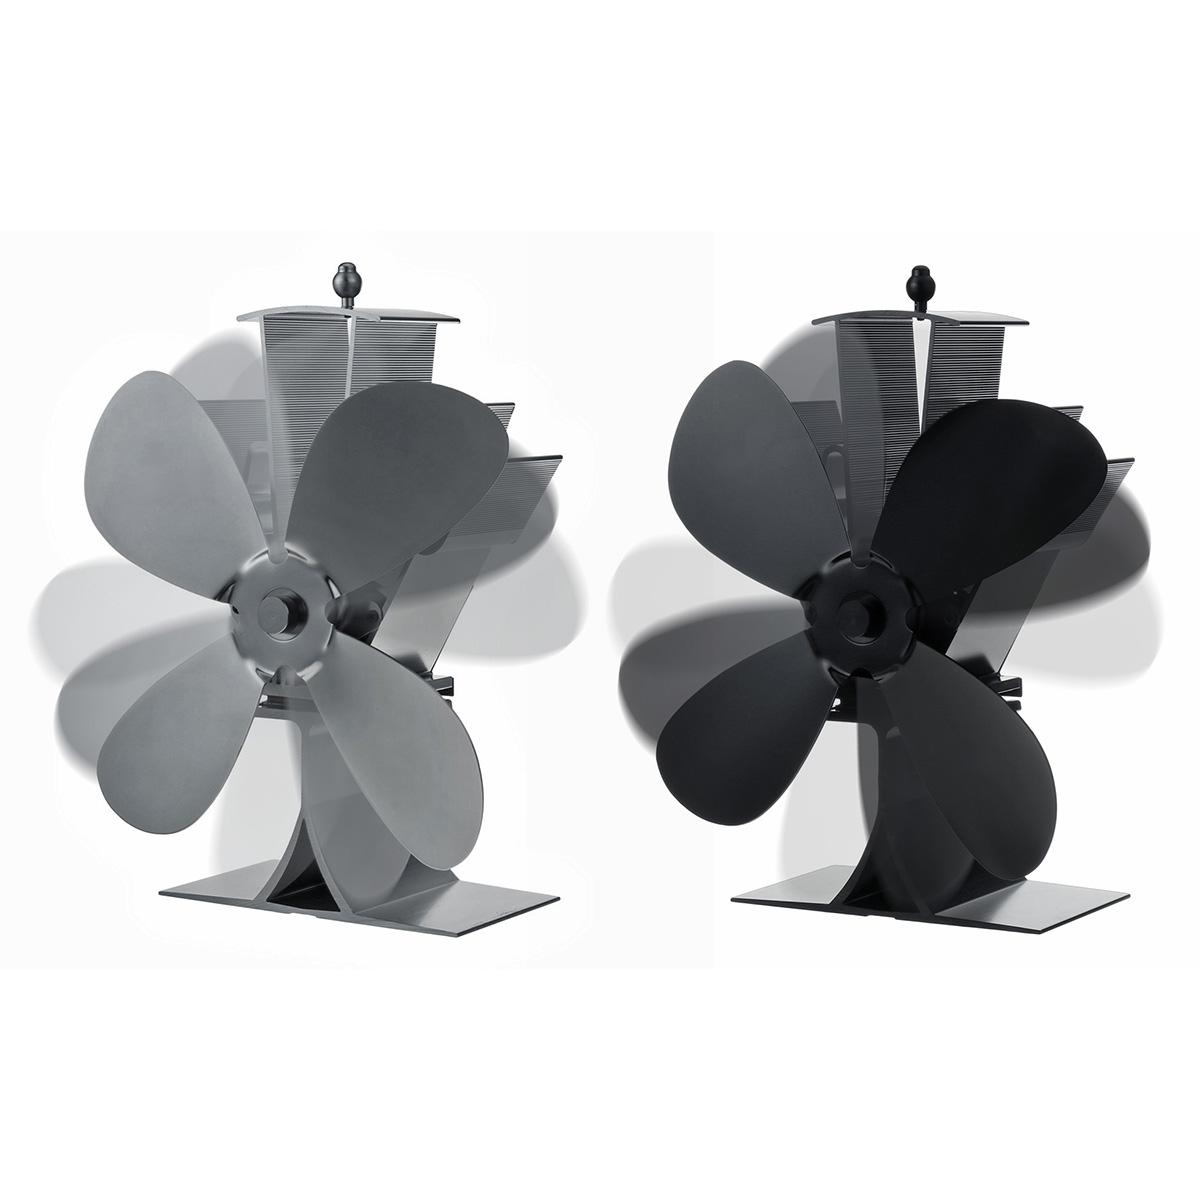 Aluminum Fireplace Fan 1100rpm Quiet